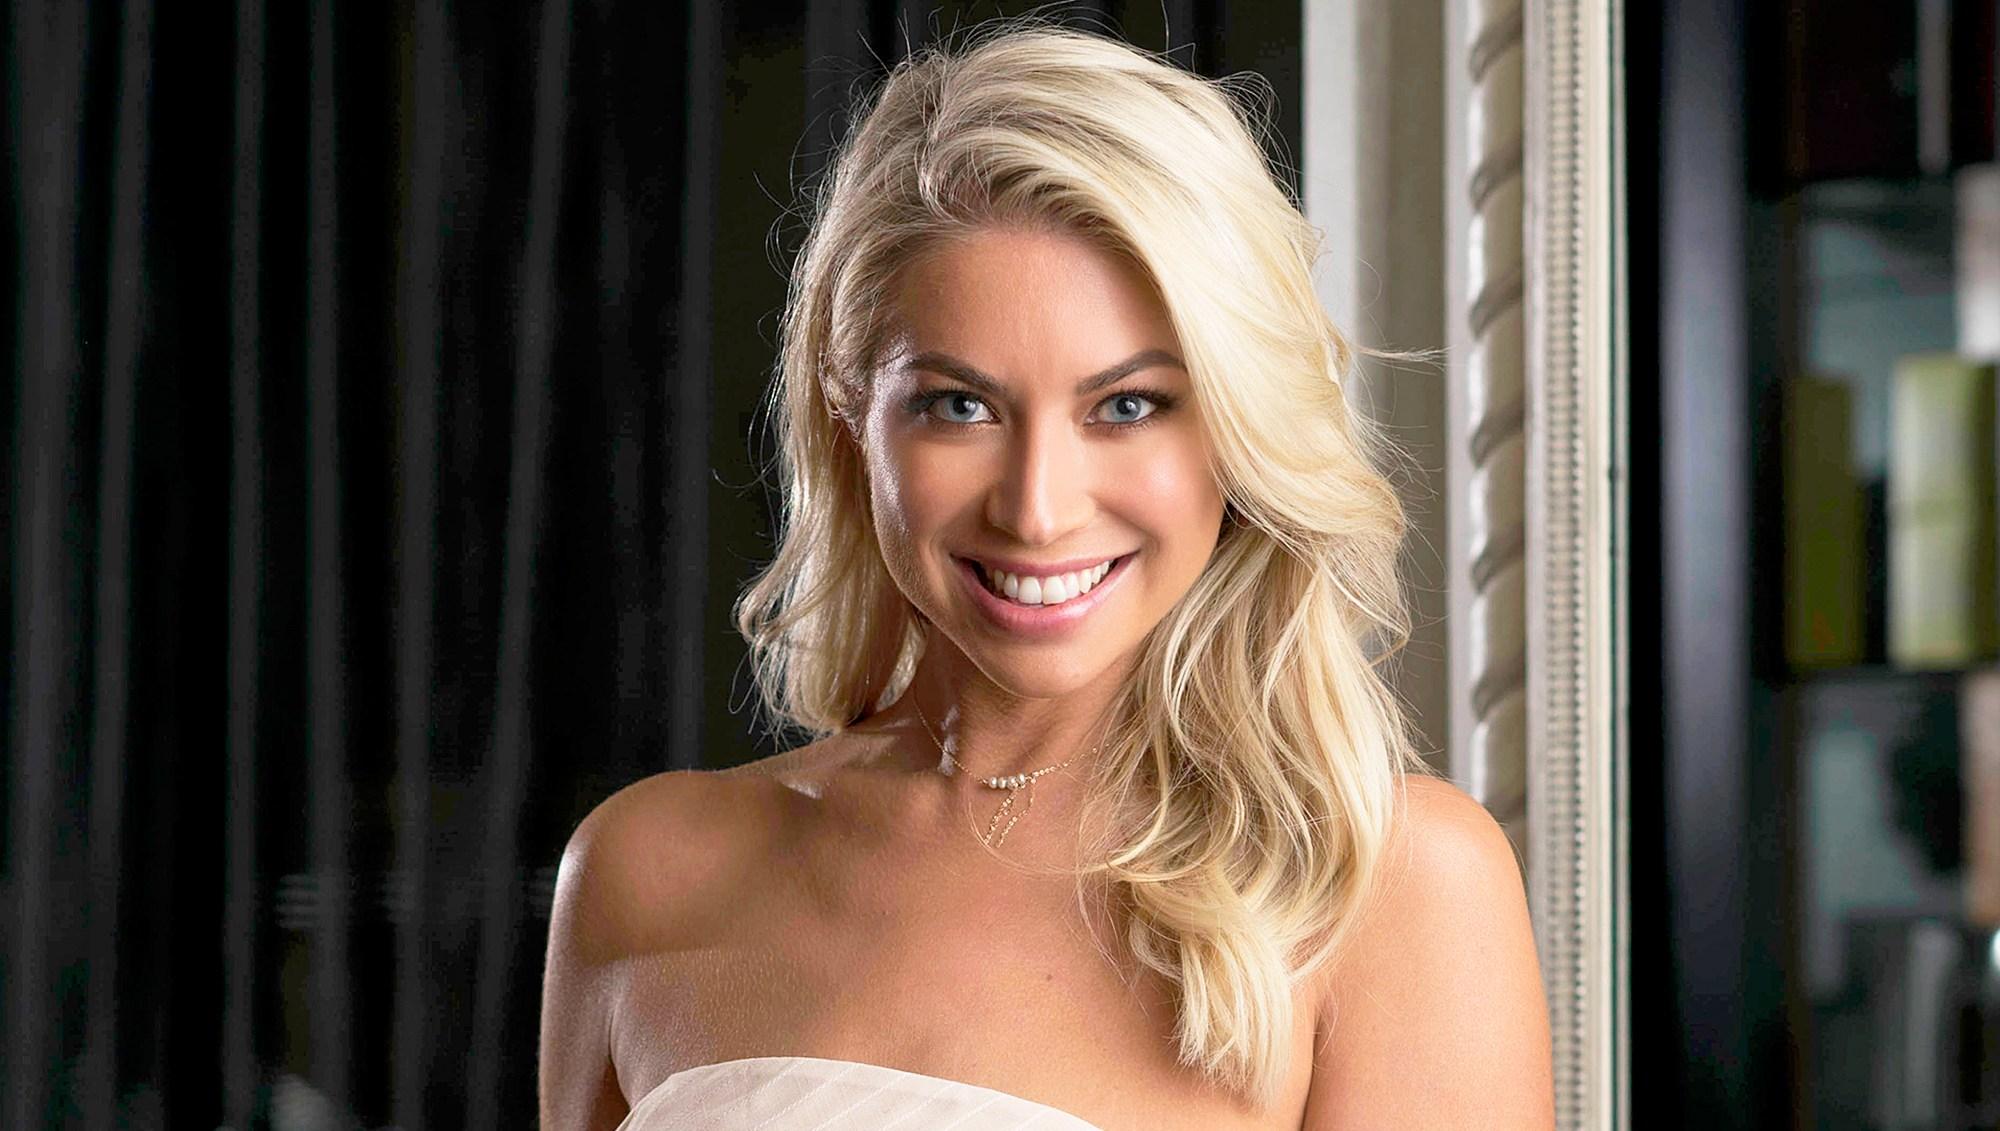 'Vanderpump Rules' star Stassi Schroeder